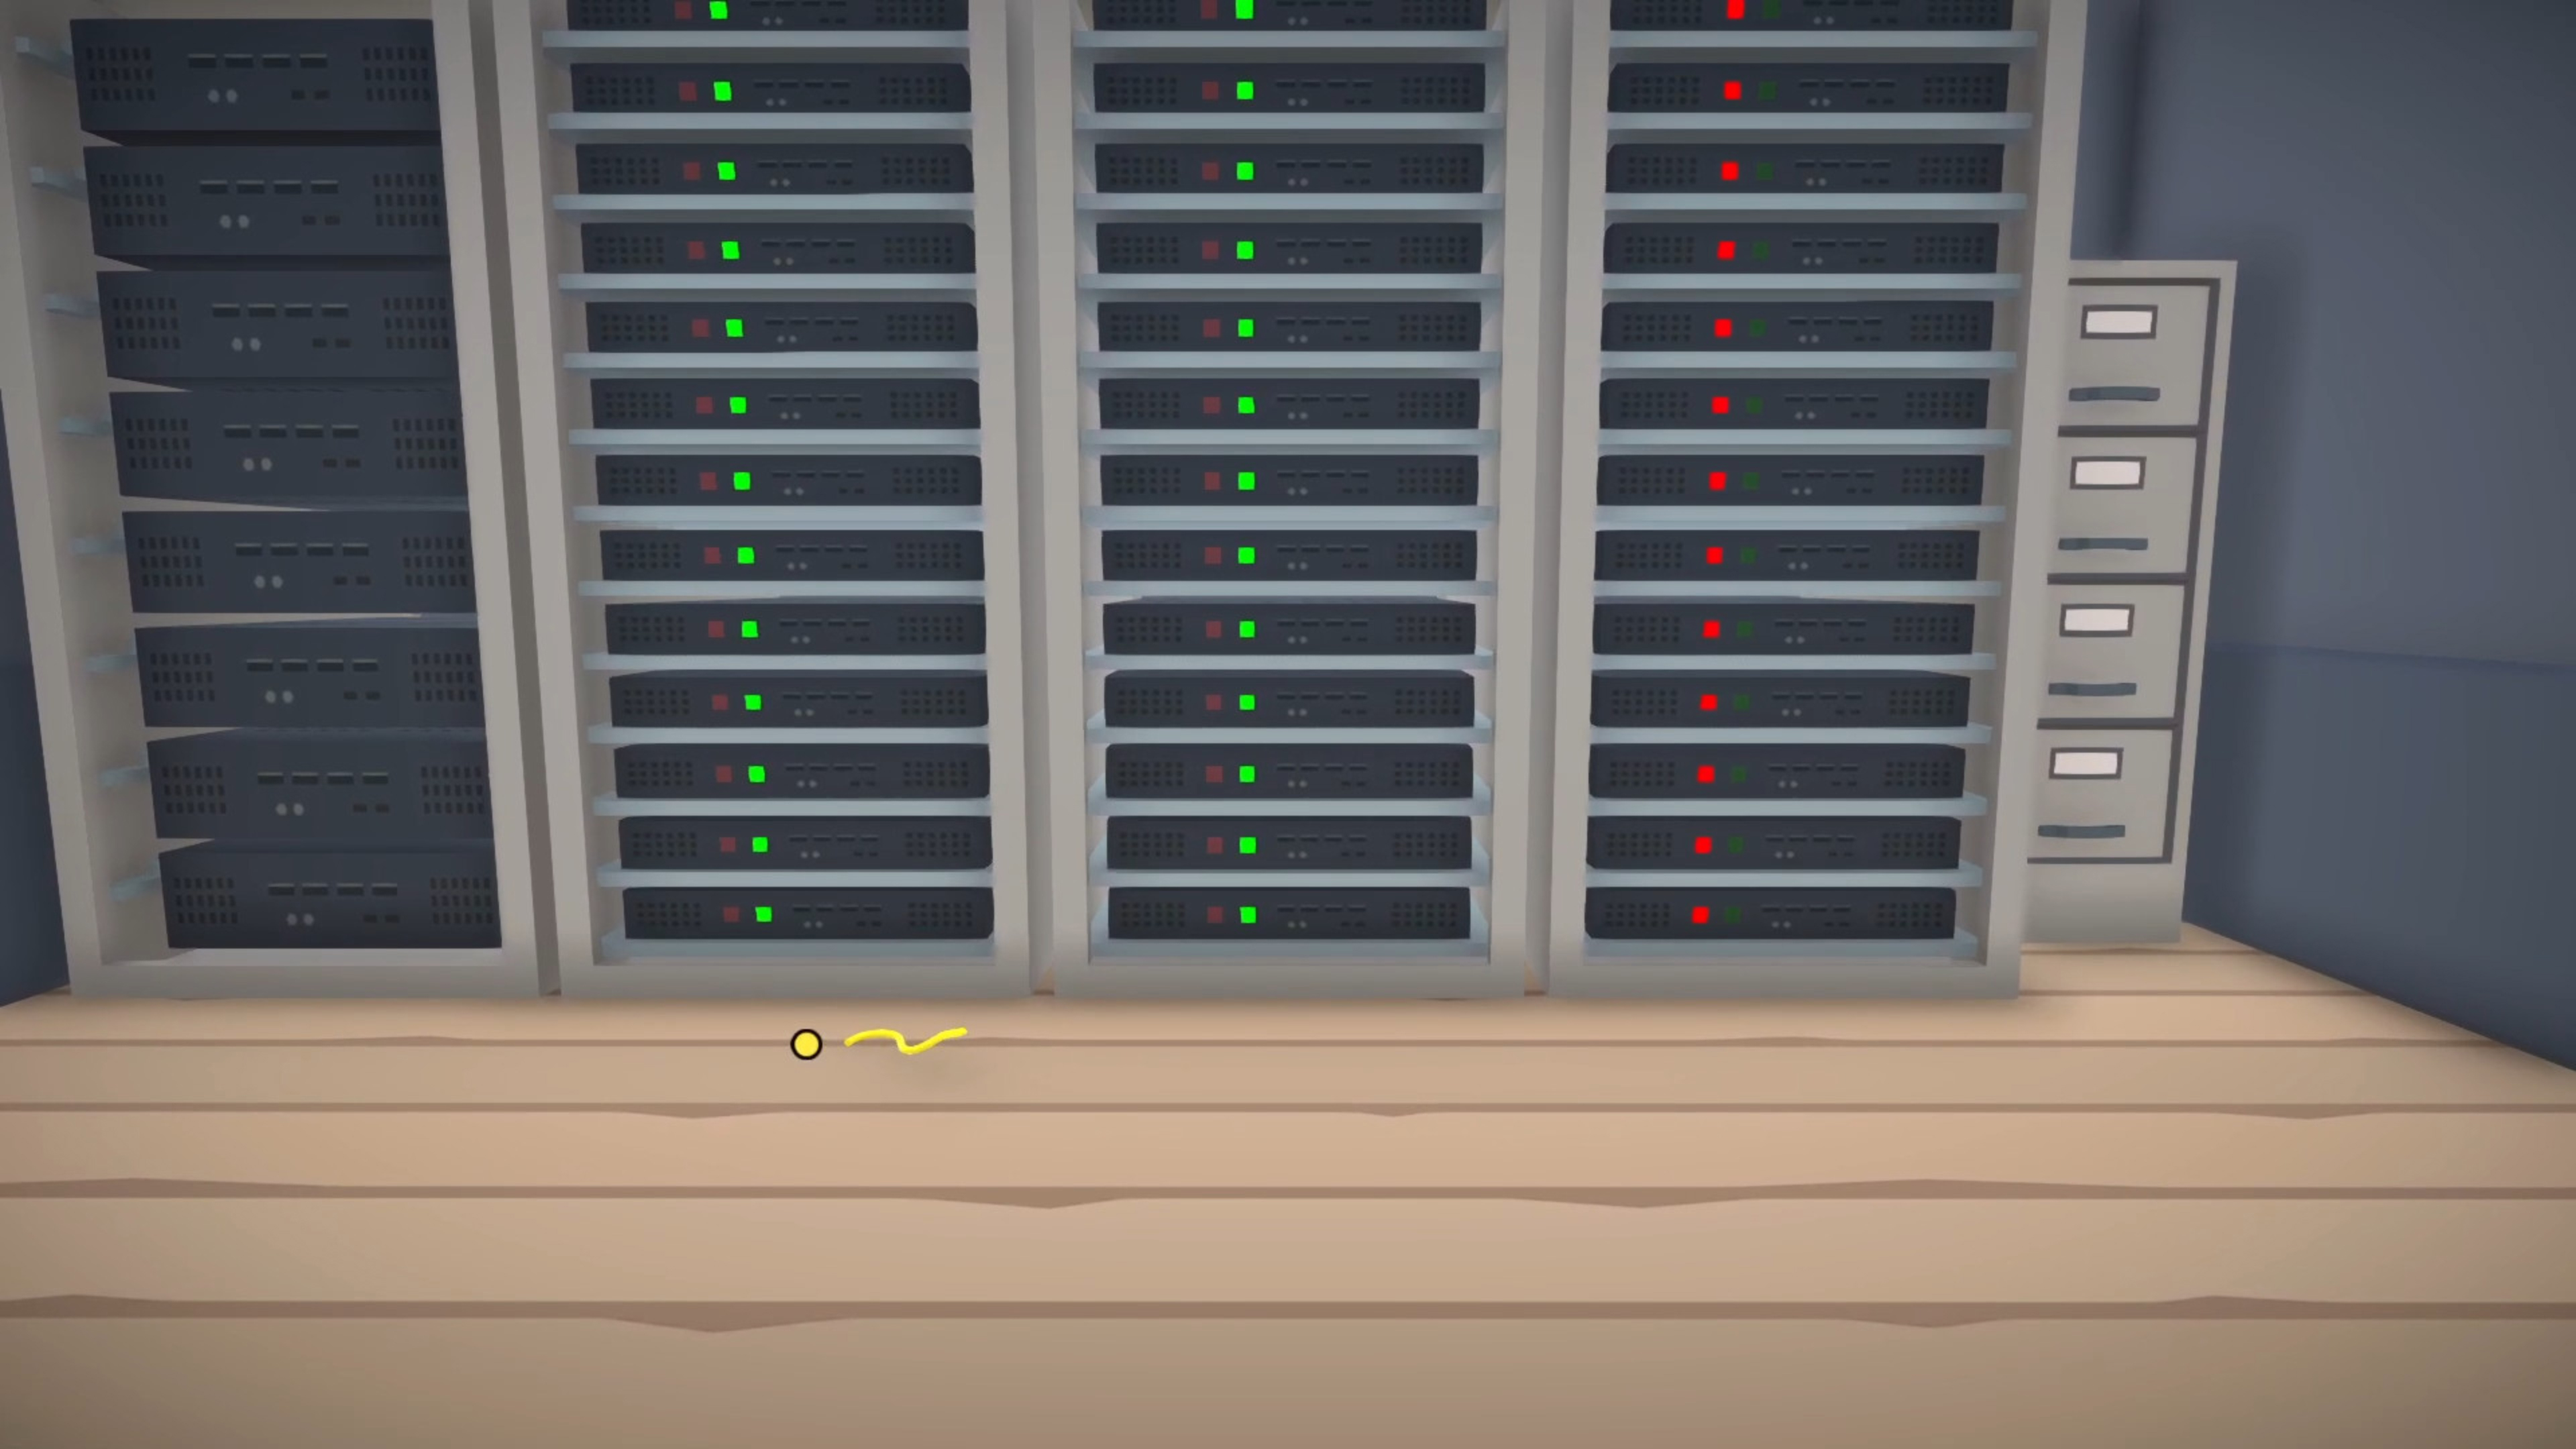 Скриншот №6 к Freddy Spaghetti 2 PS4 and PS5